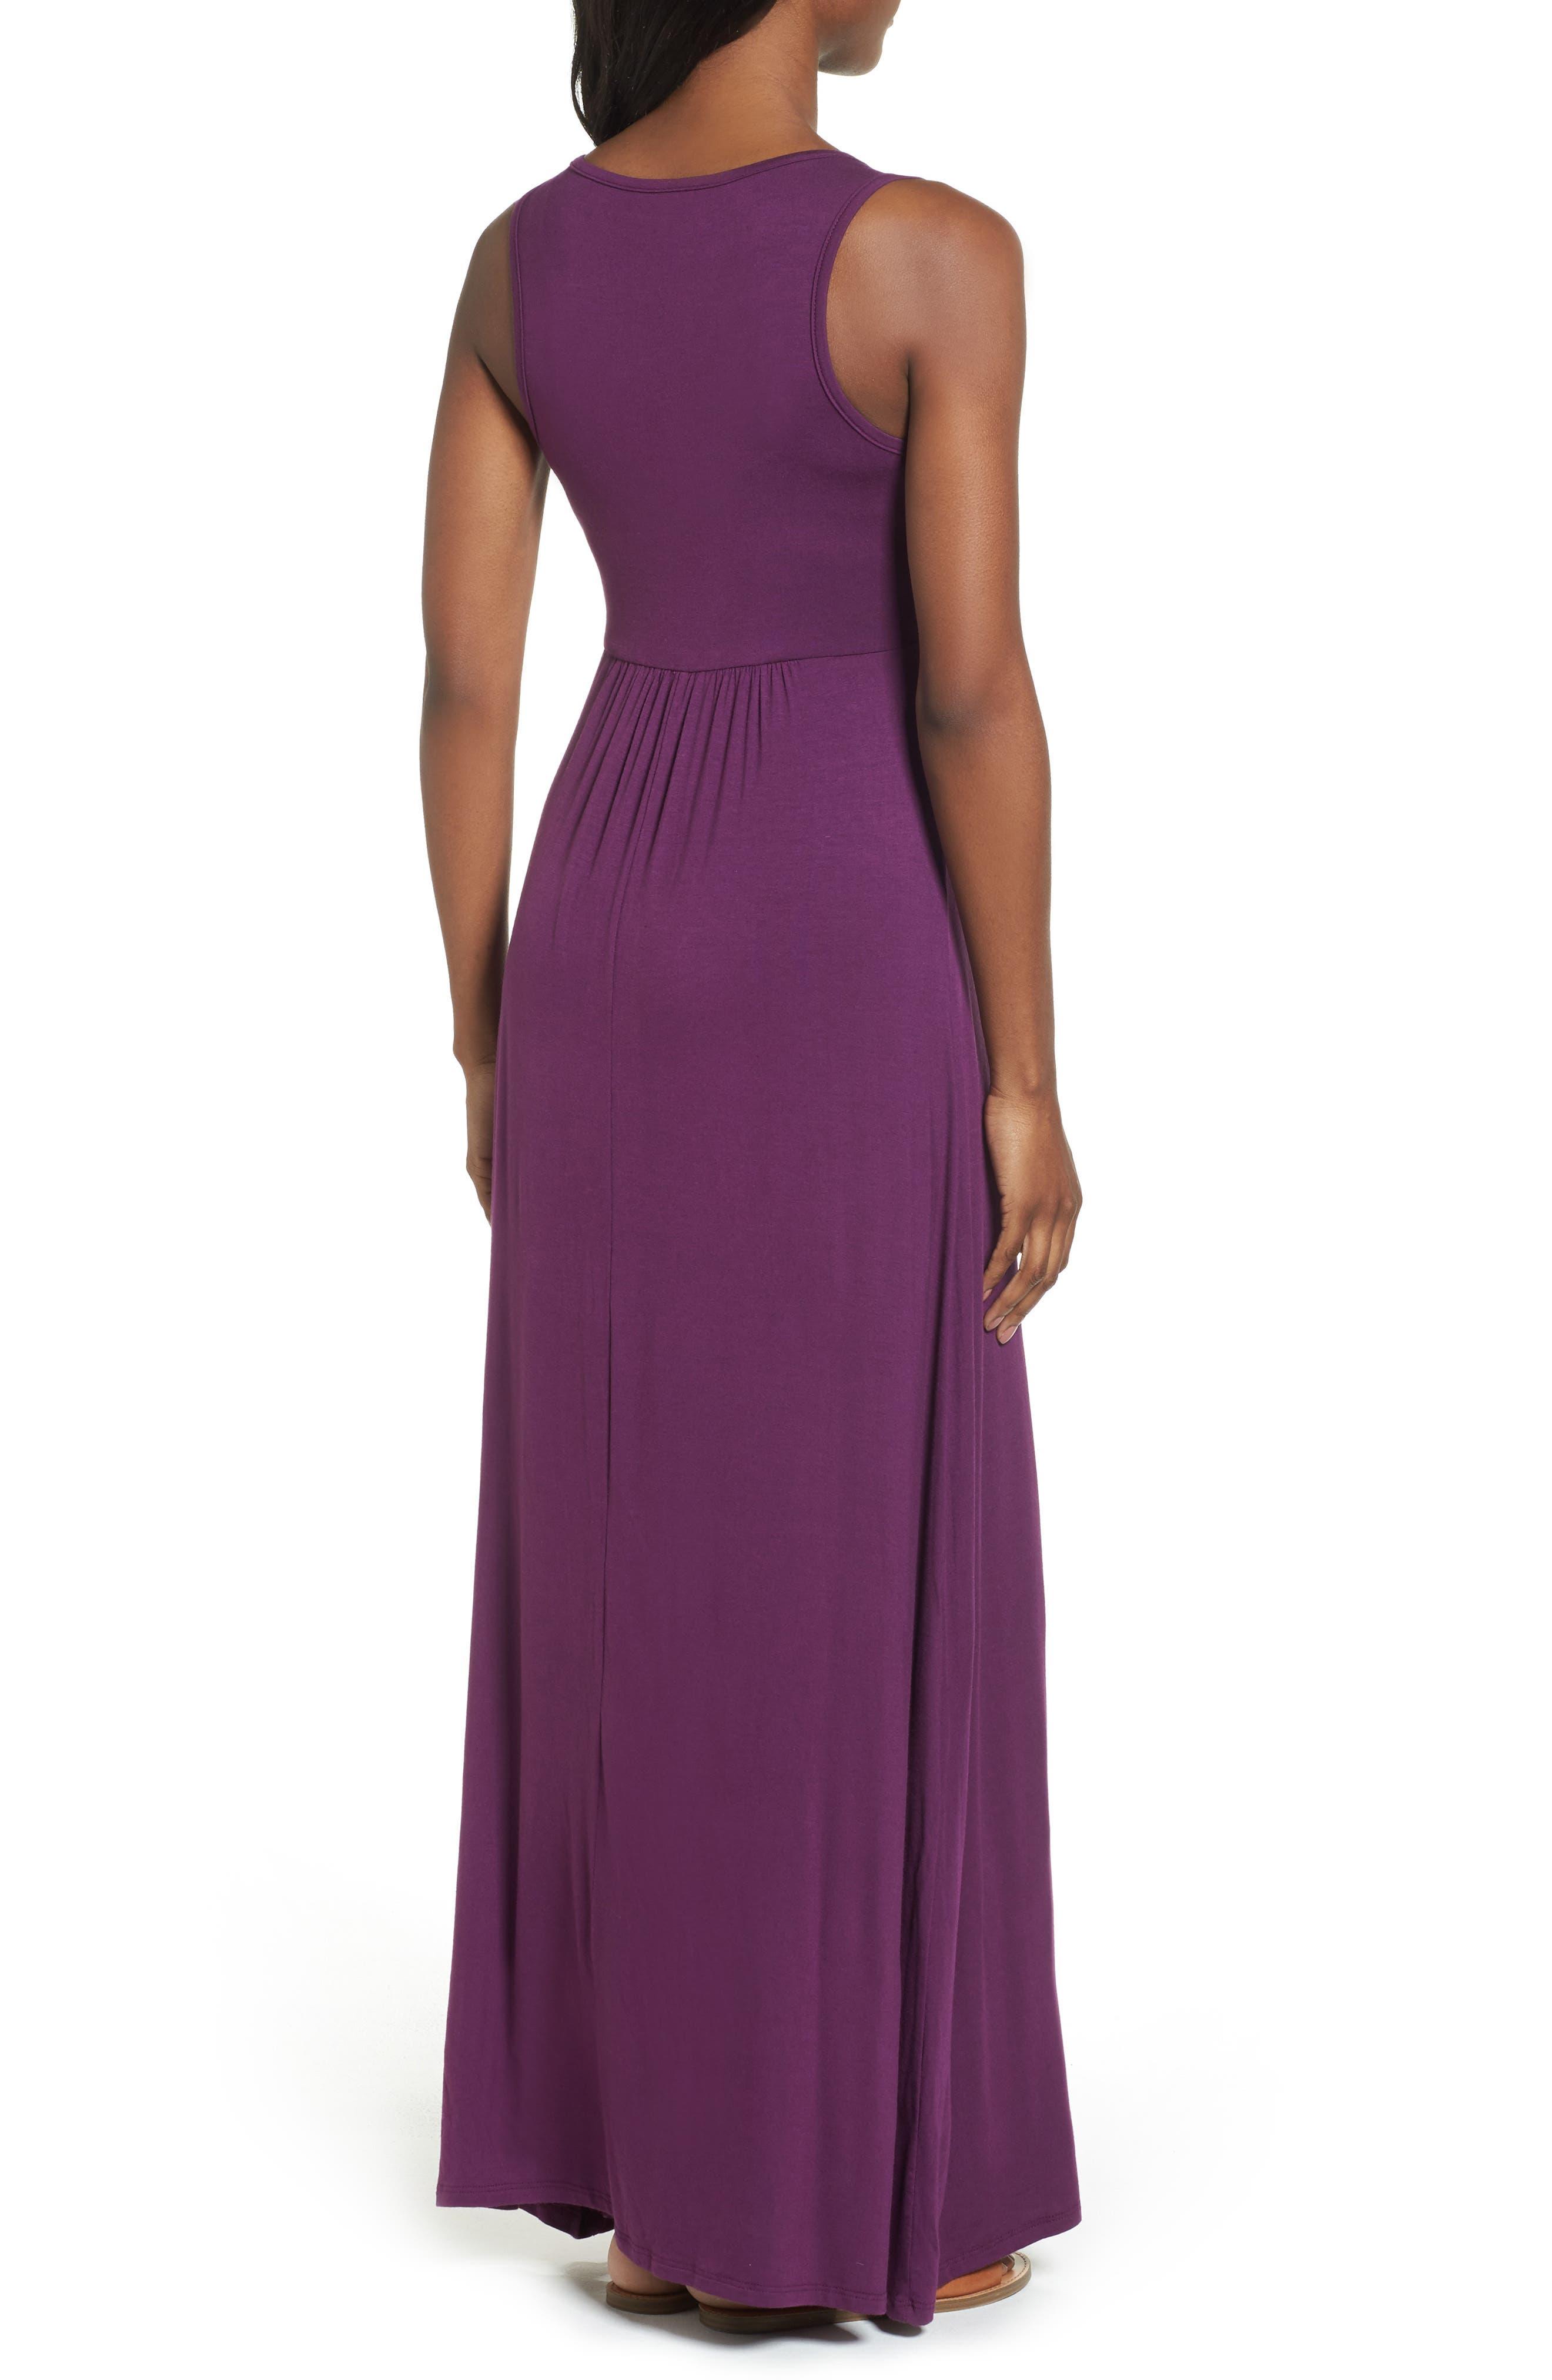 LOVEAPPELLA, V-Neck Jersey Maxi Dress, Alternate thumbnail 2, color, PURPLE DARK